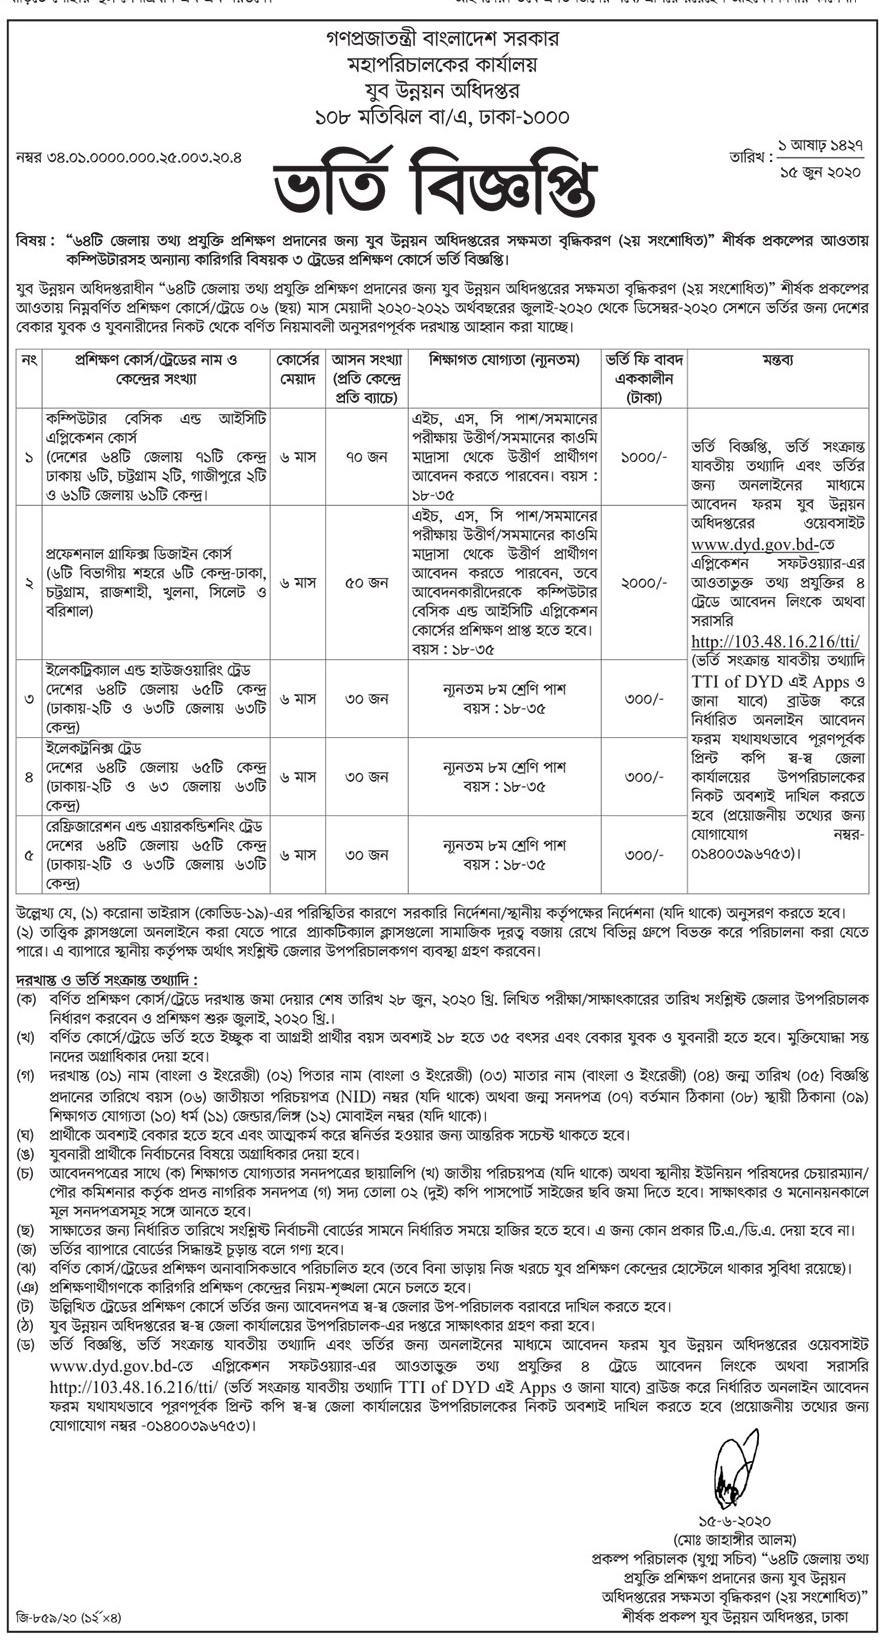 Bangladesh Youth Development Job Circular 2020